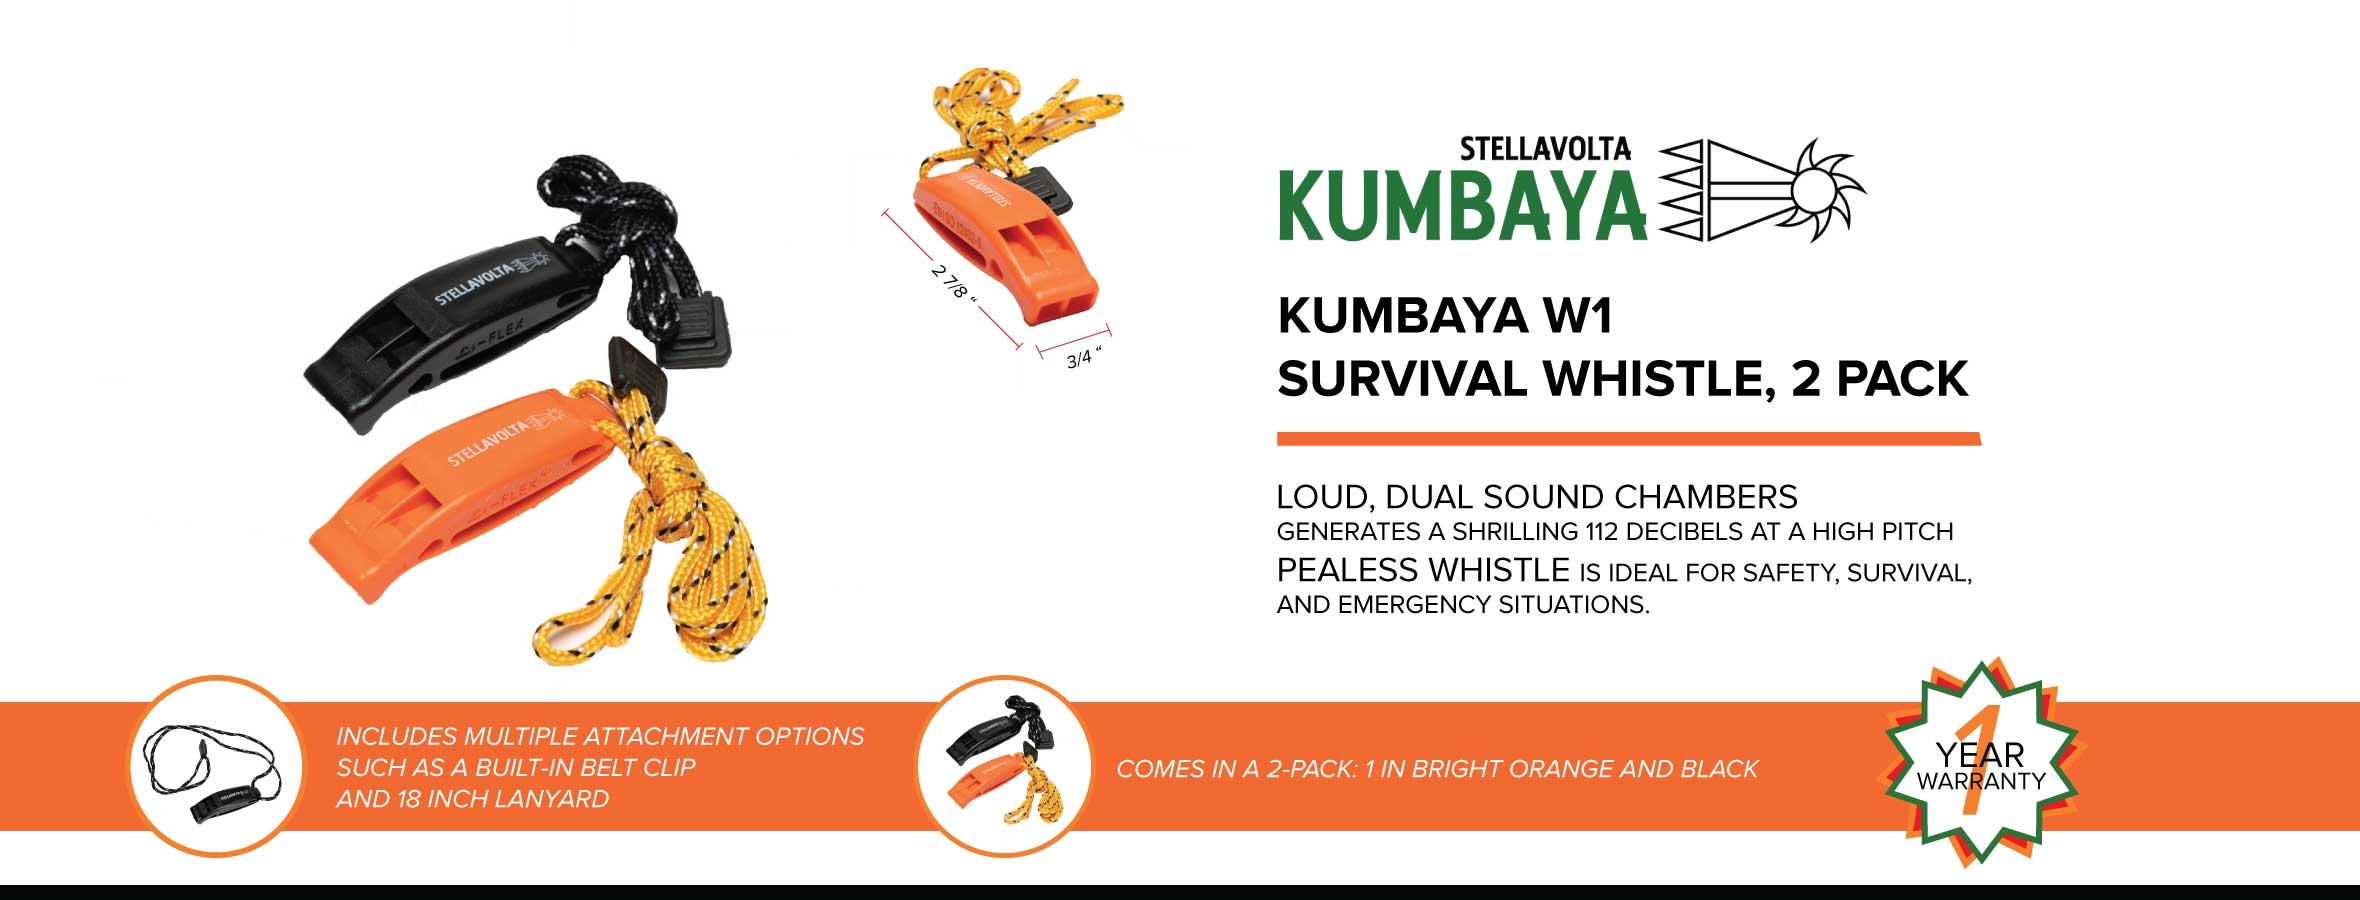 Kumbaya W1 Survival Whistle Ad